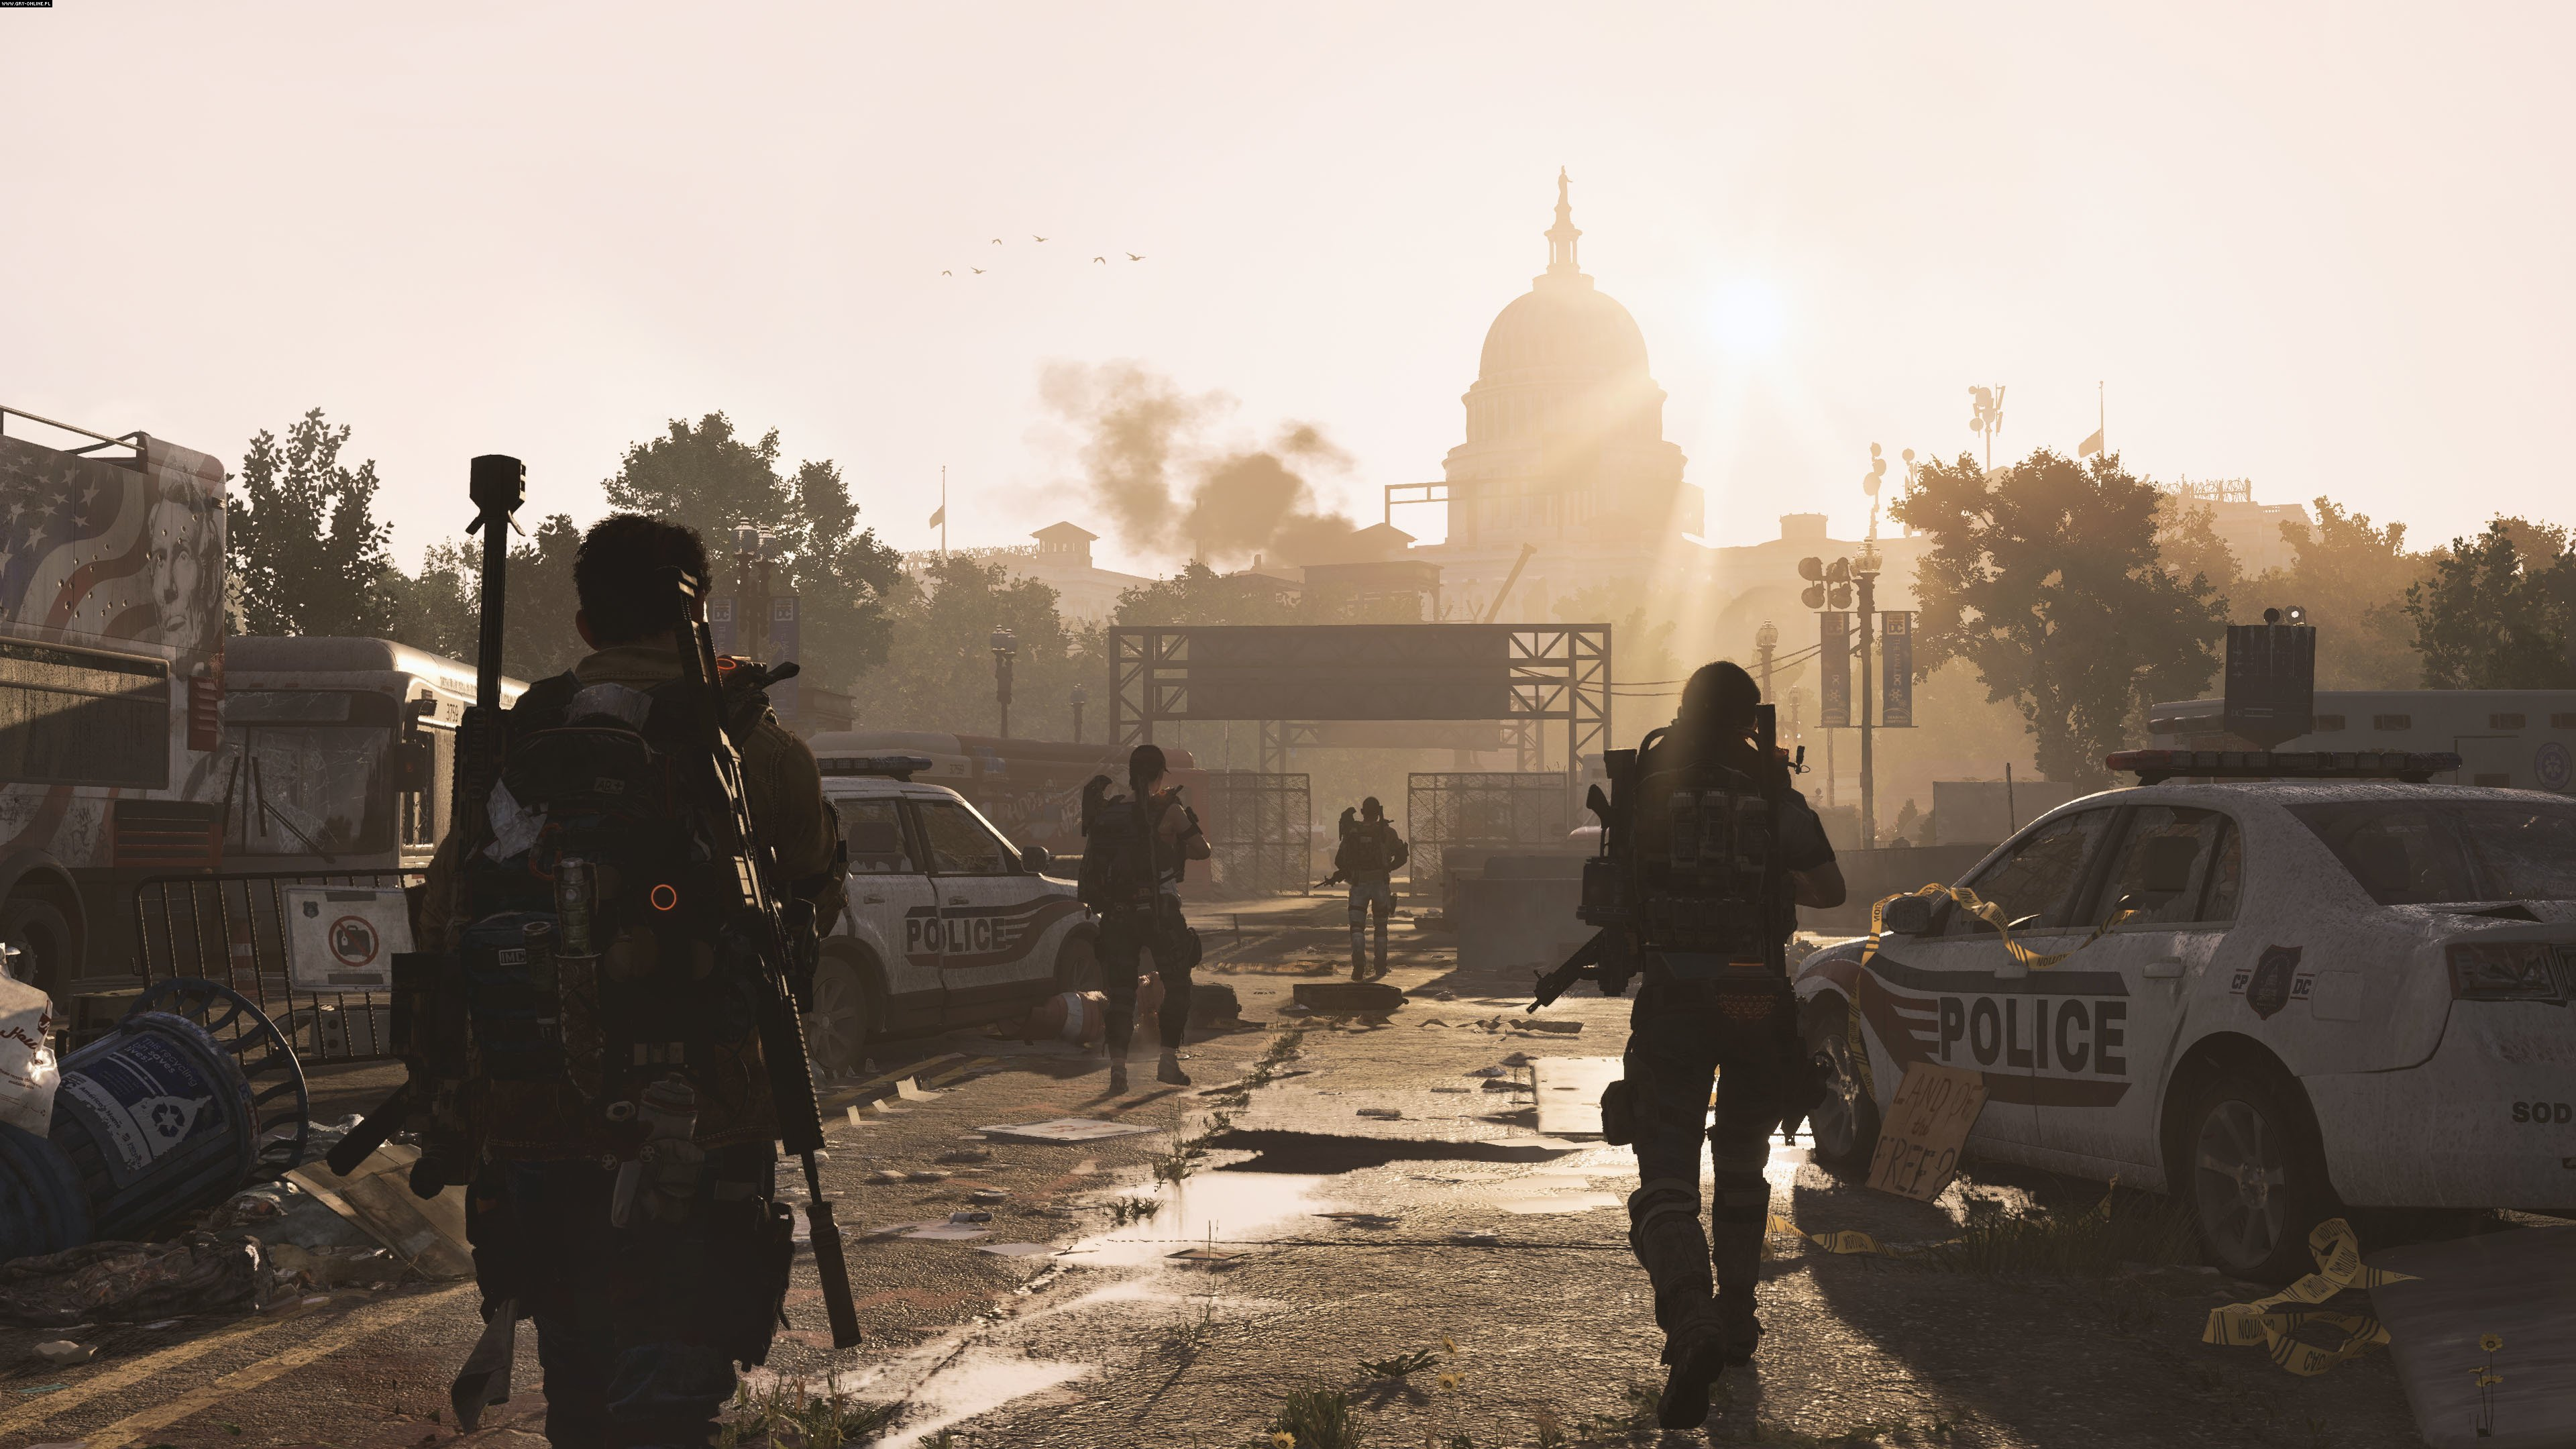 Tom Clancy's The Division 2 PC, PS4, XONE Games Image 23/23, Massive Entertainment / Ubisoft Massive, Ubisoft